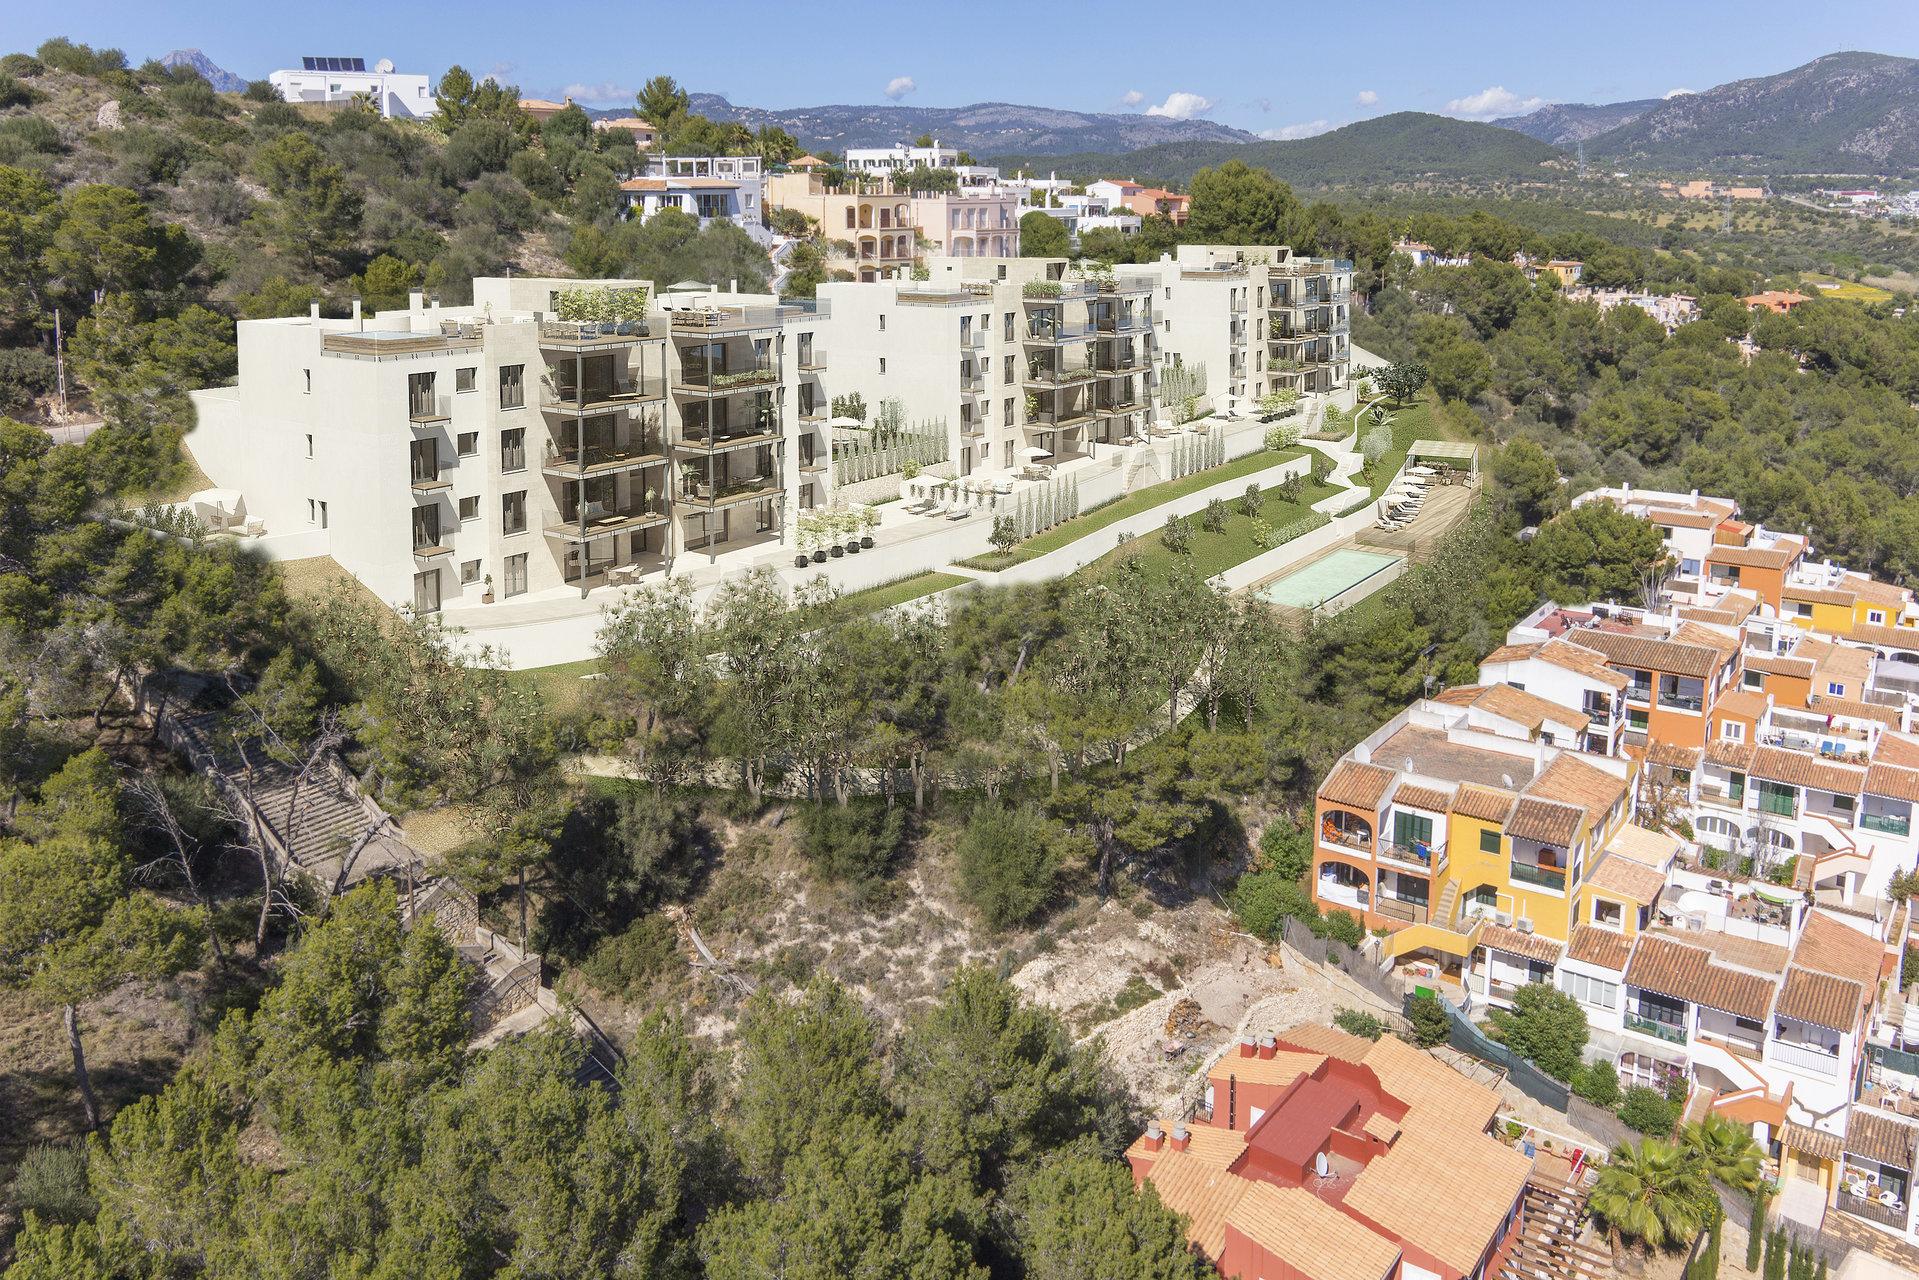 Ad Sale Apartment Santa Ponsa (07180) ref:V0549SP